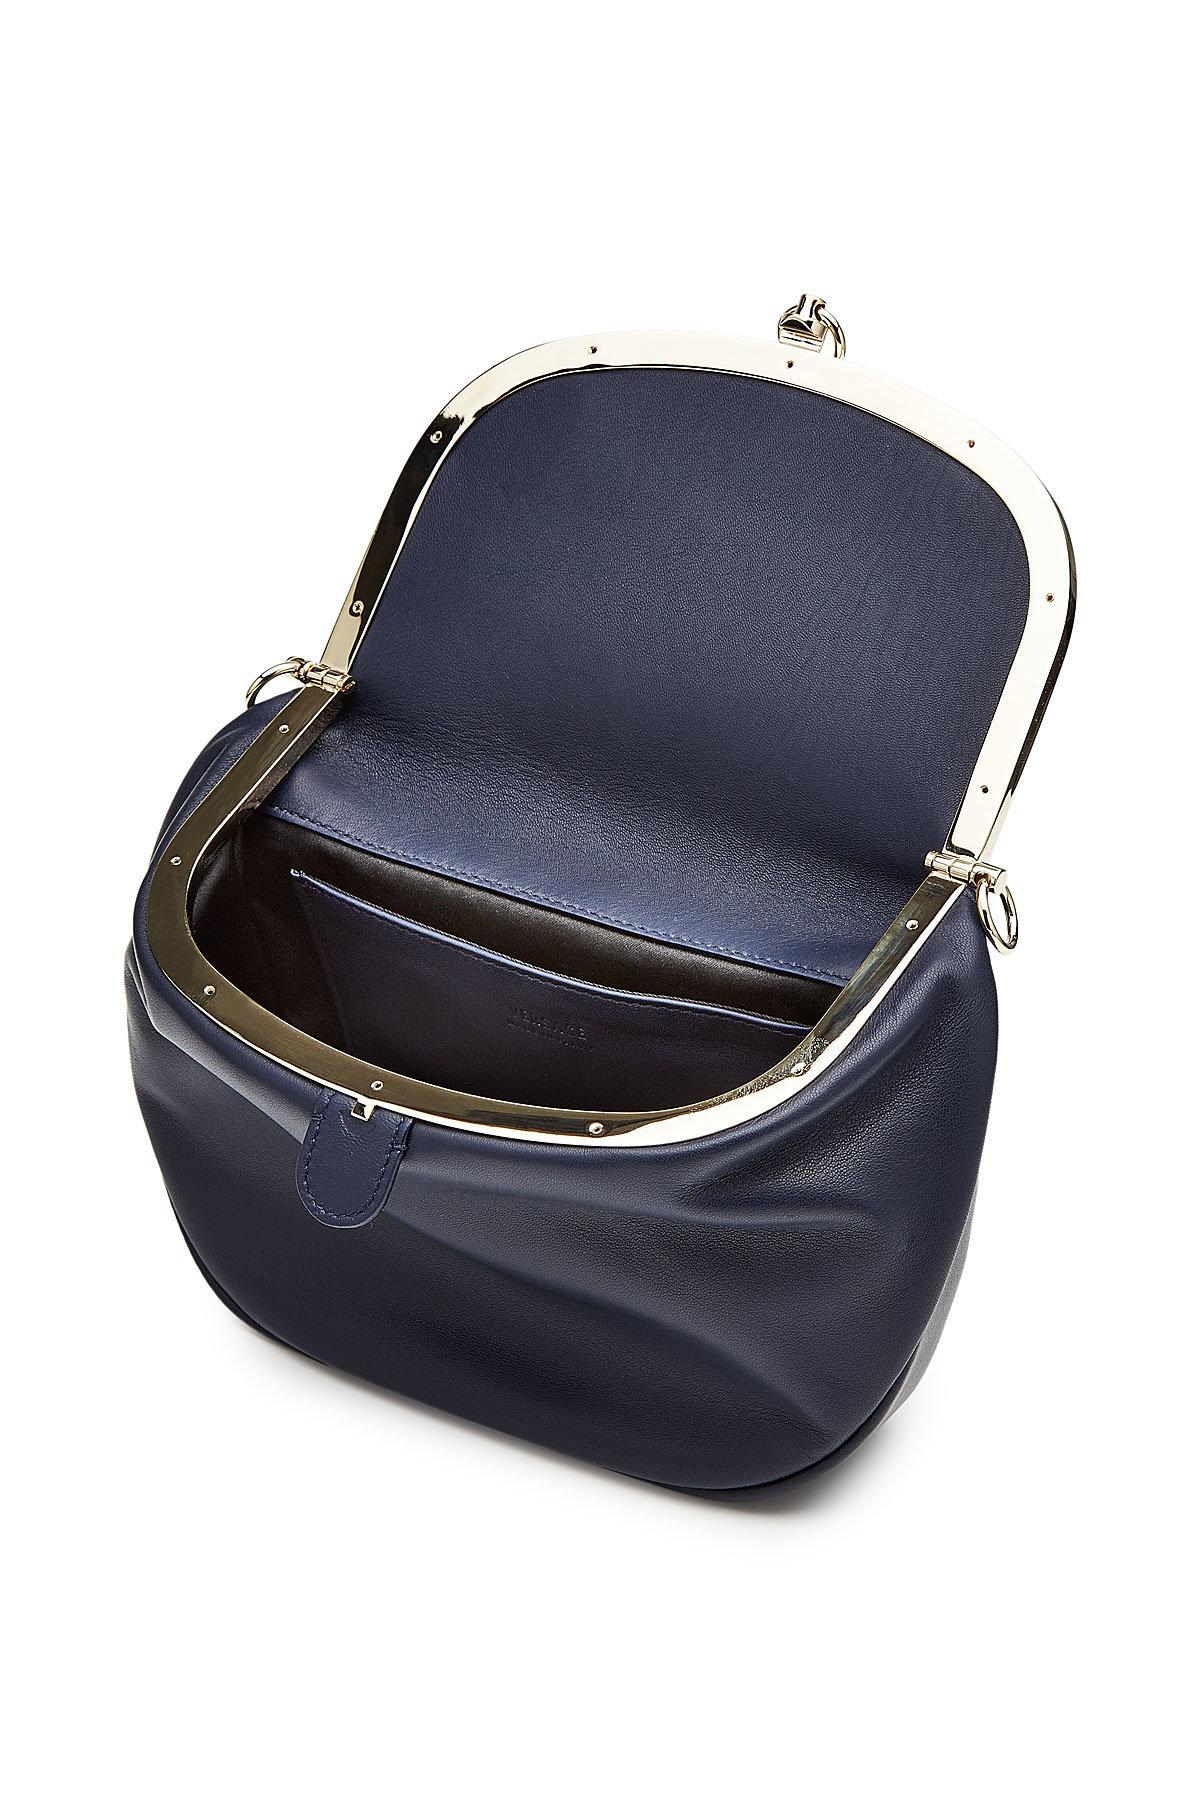 Versace The Taj Shoulder Bag 4GwLfNi